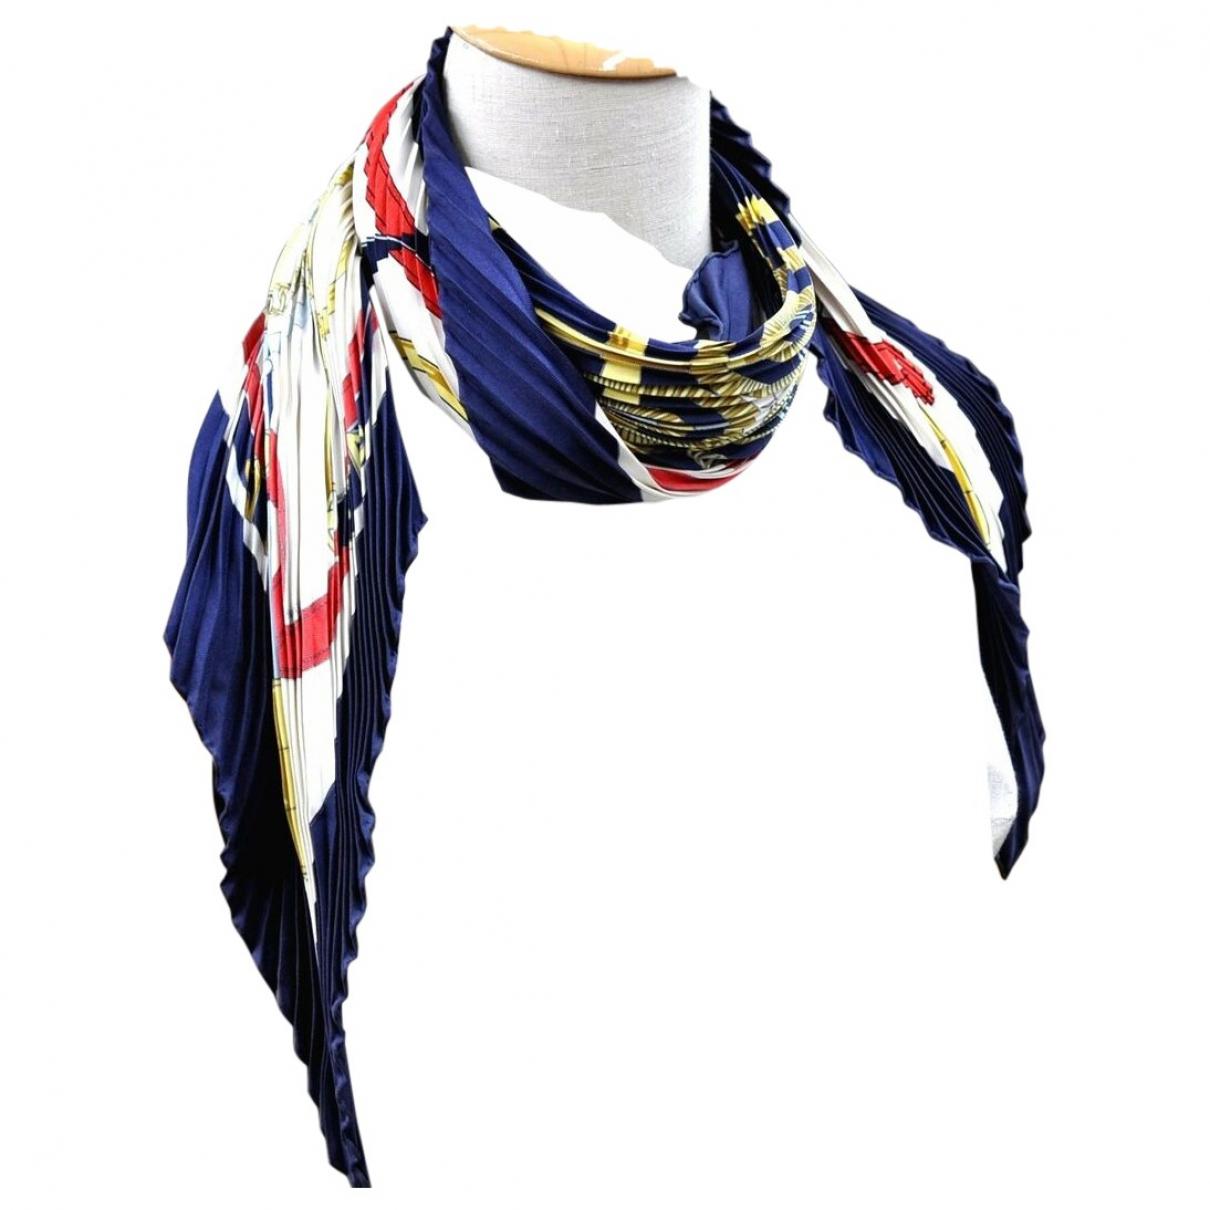 Hermes - Foulard   pour femme en soie - marine